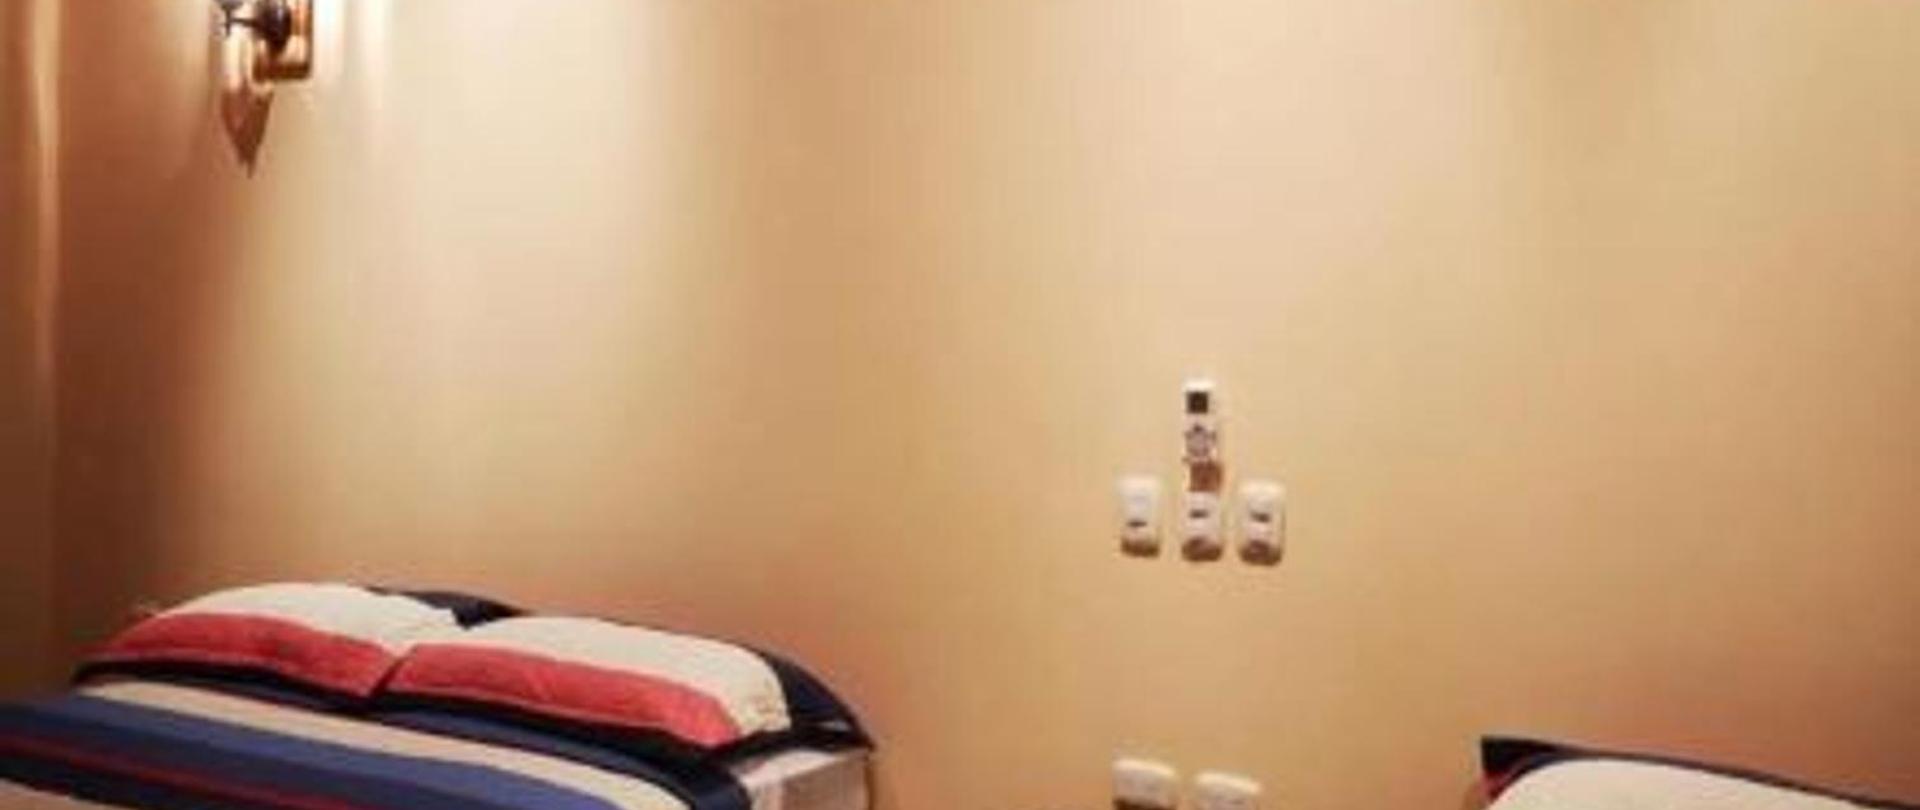 room 15-1.jpg